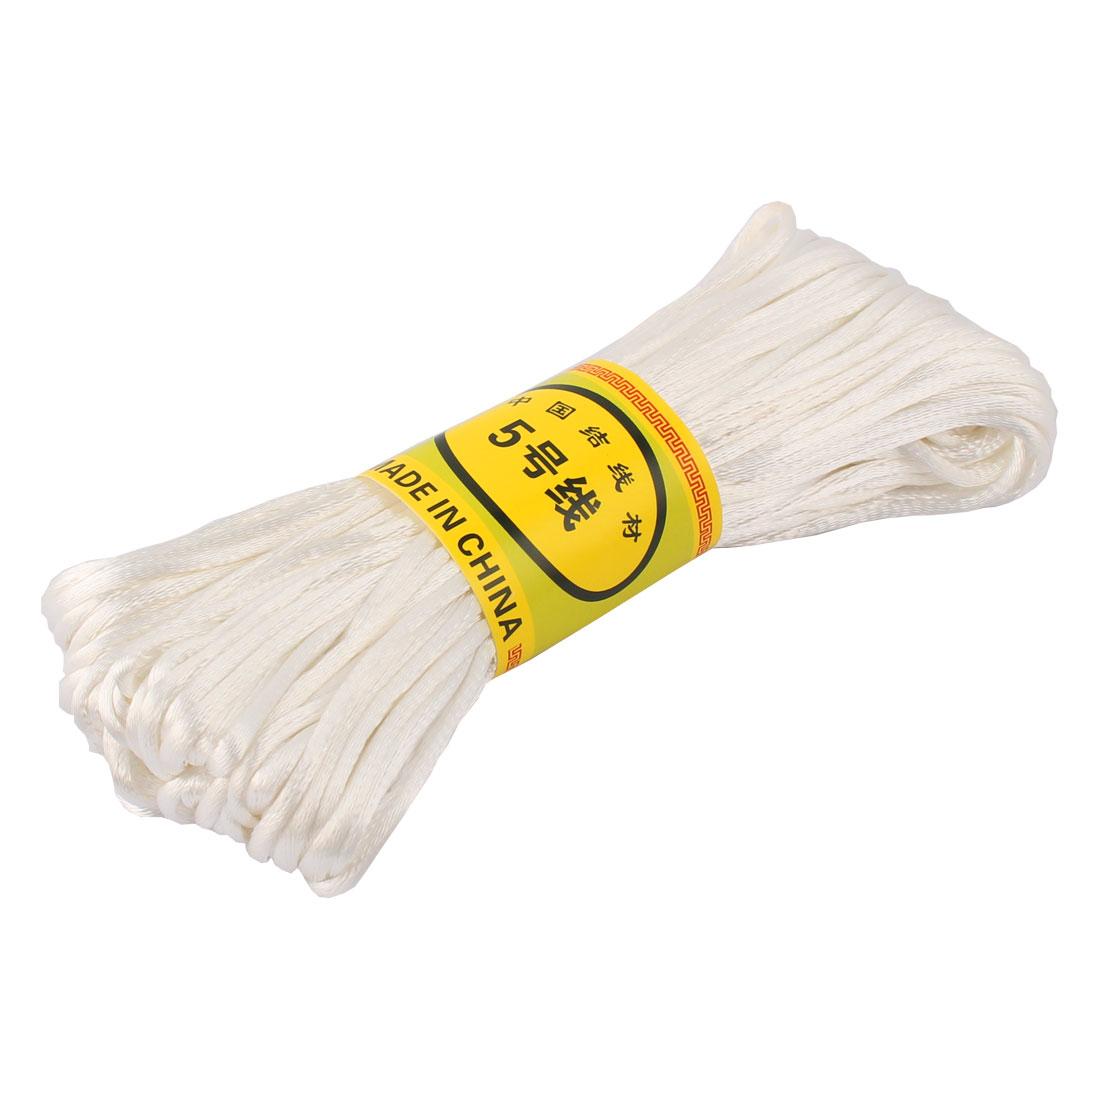 White Nylon Cord Thread DIY Chinese Knot Macrame Rattail Bracelet Braided String 20M